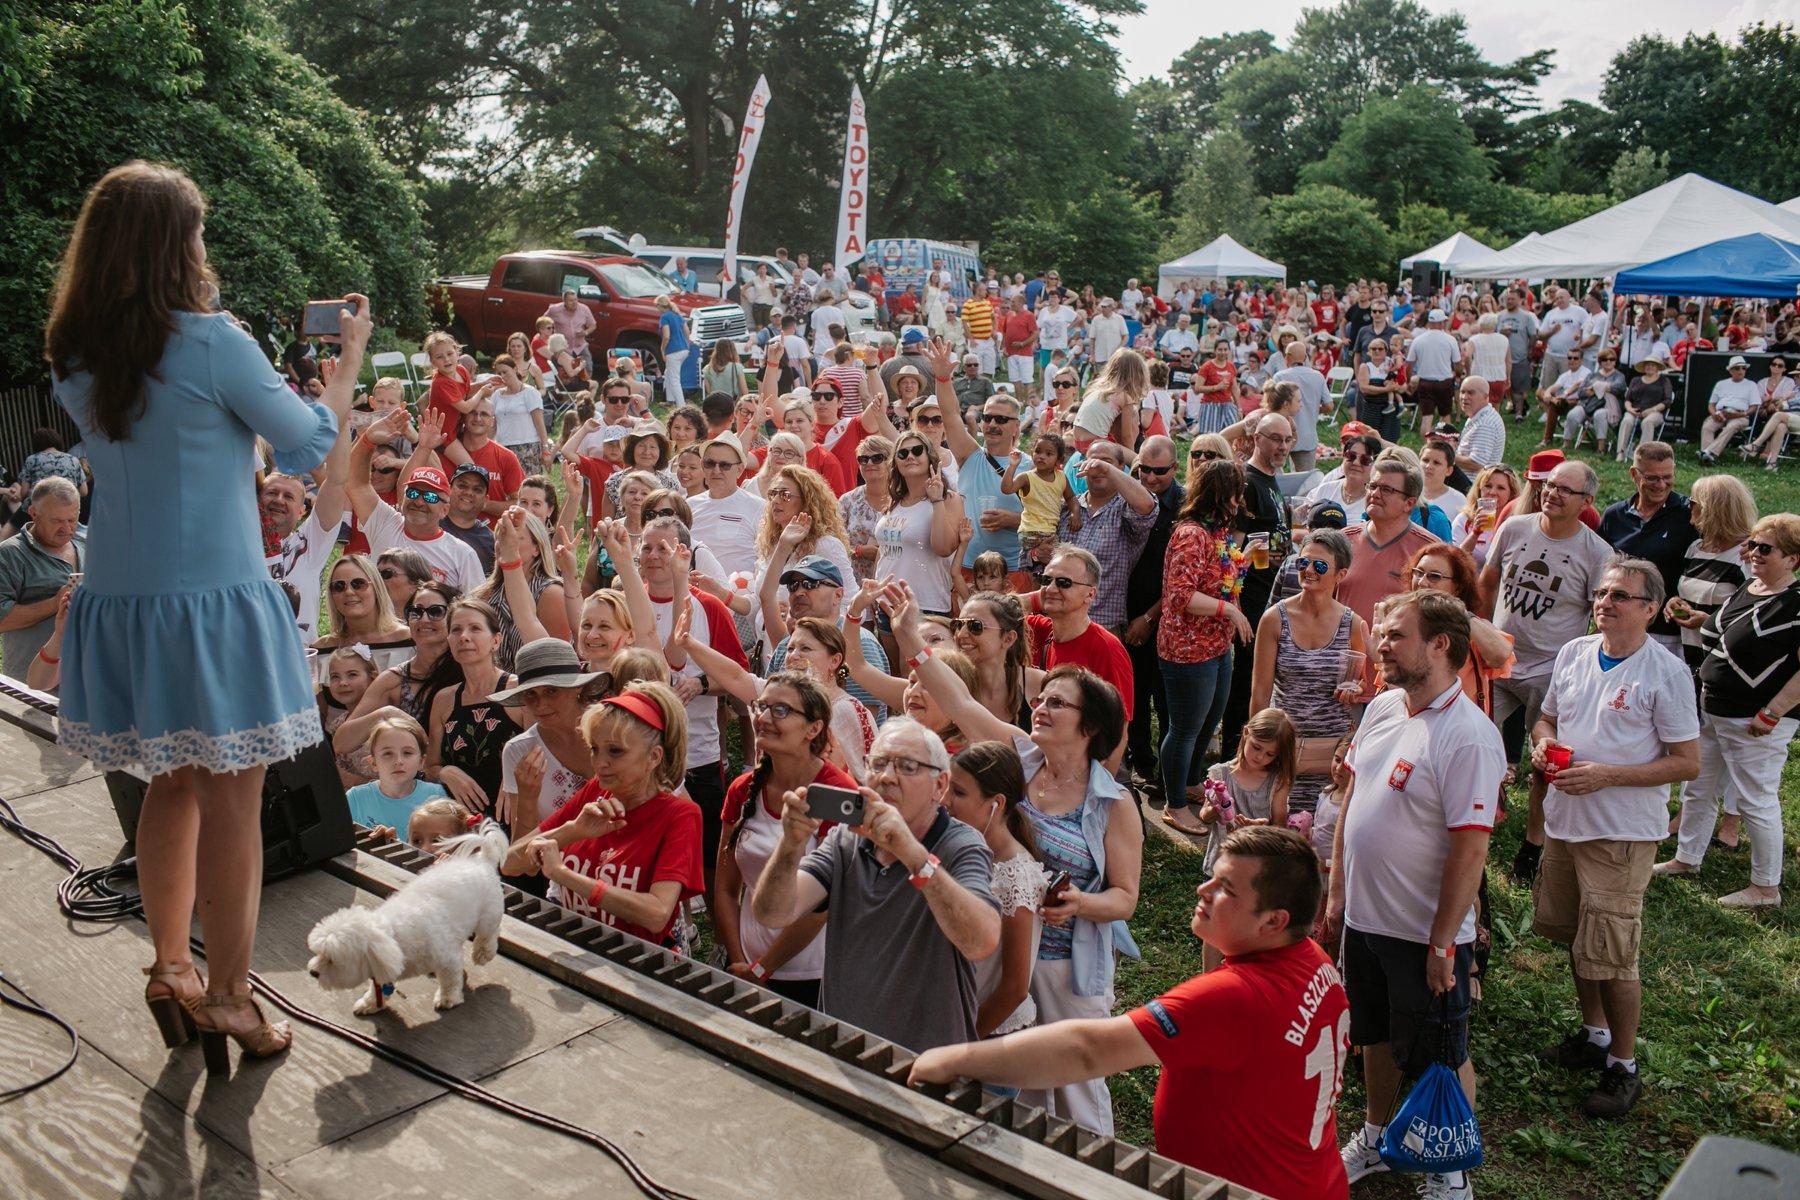 The 11th Annual Polish Festival